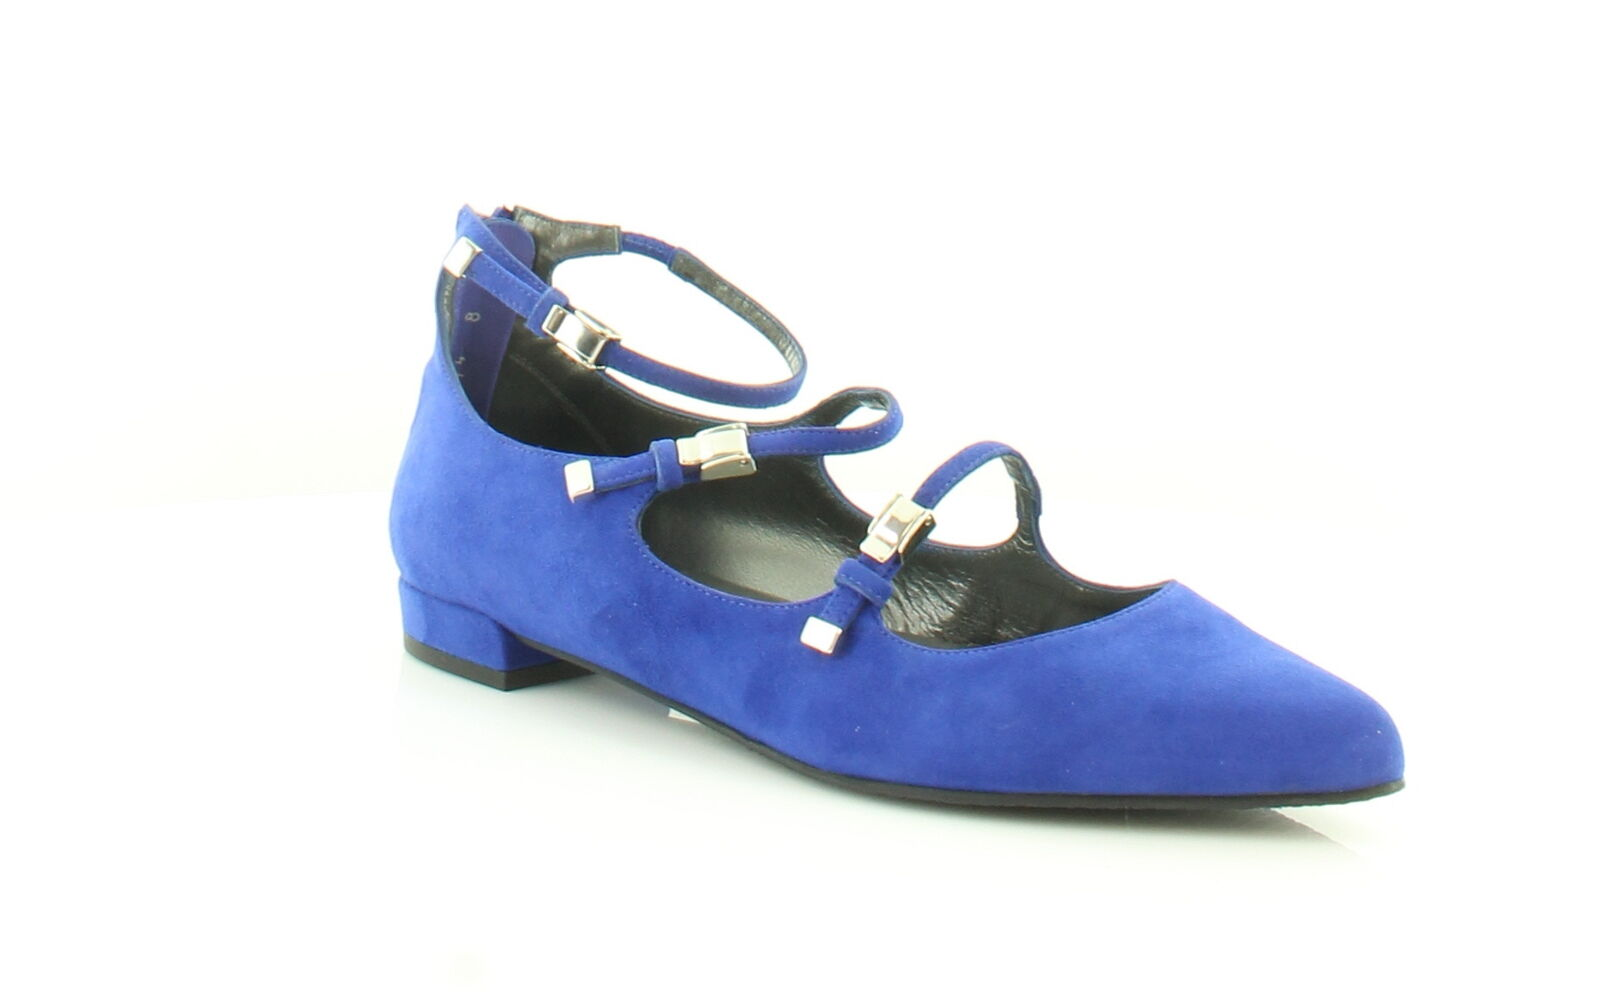 Stuart Weitzman New Flippy Blue Womens Shoes Size 8 M Flats MSRP $398